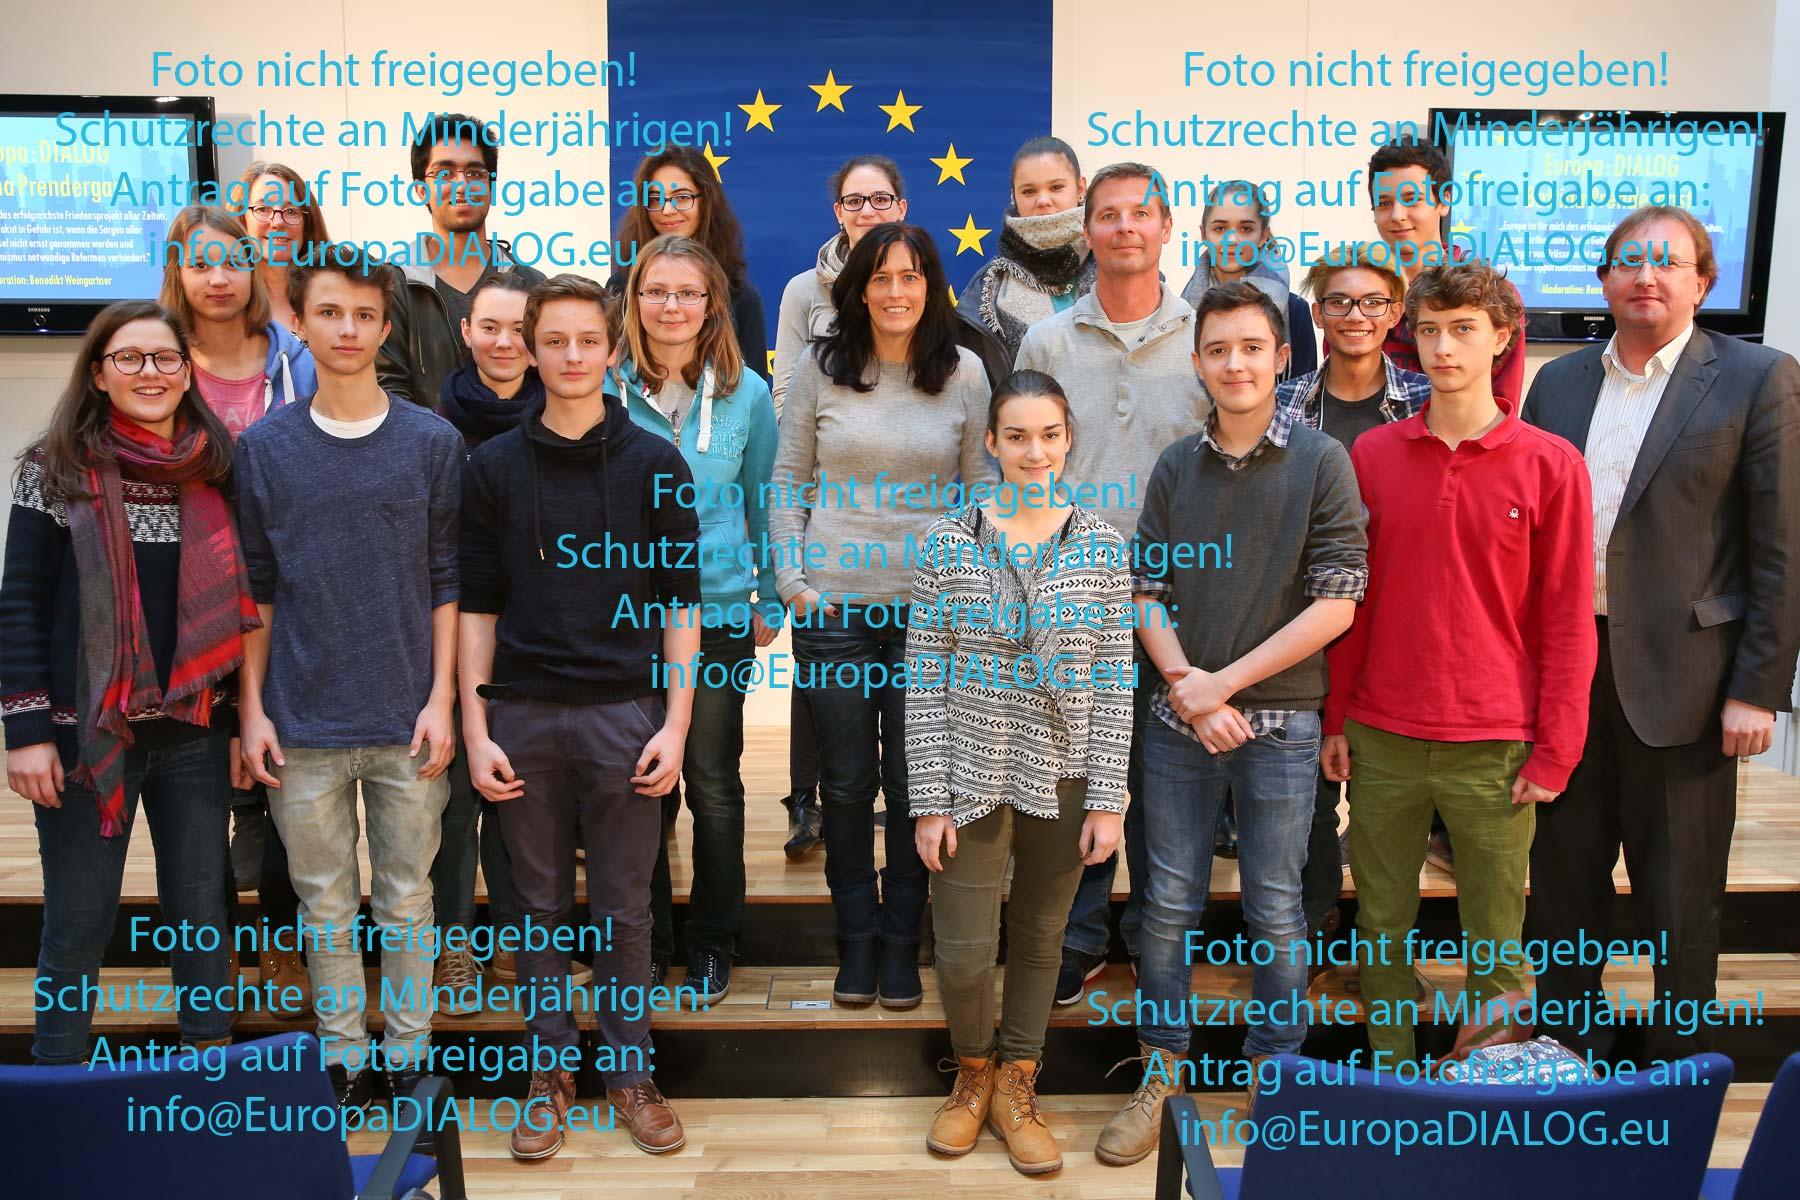 europadialog_bettina-prendergast_s_e04_gb-18-klosterg_031853_-katharina-schiffl__